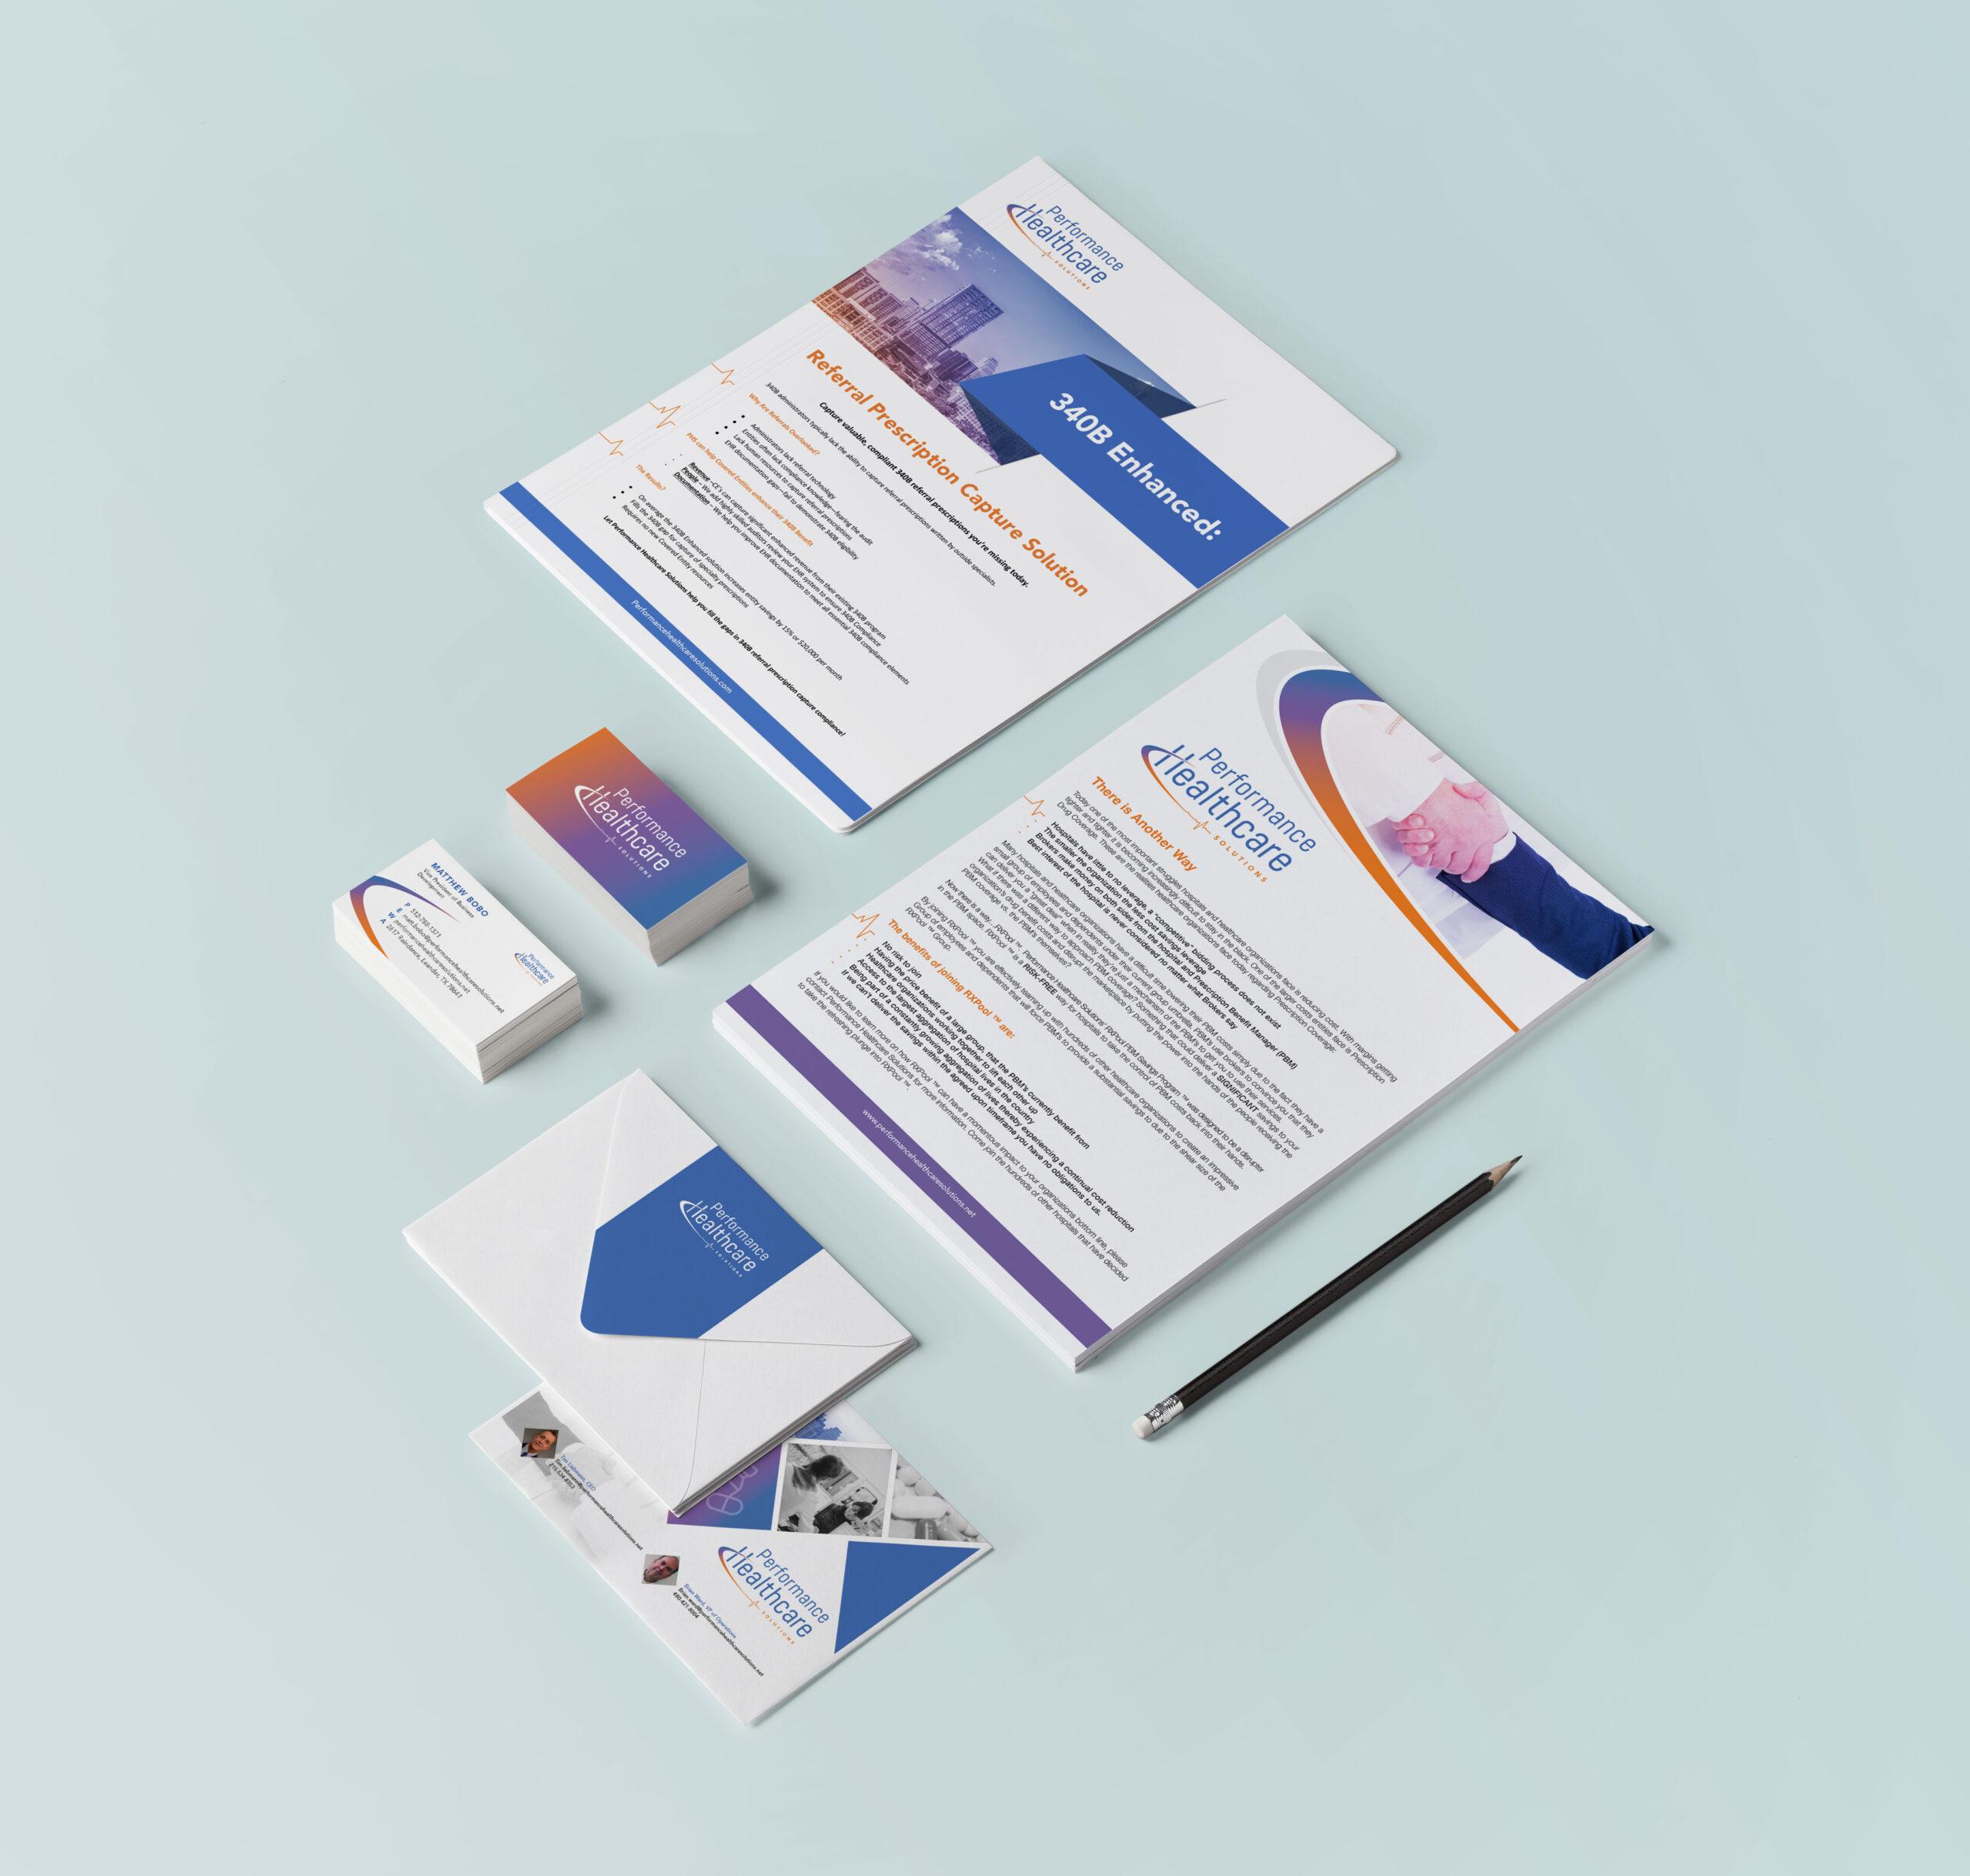 phs program and materials